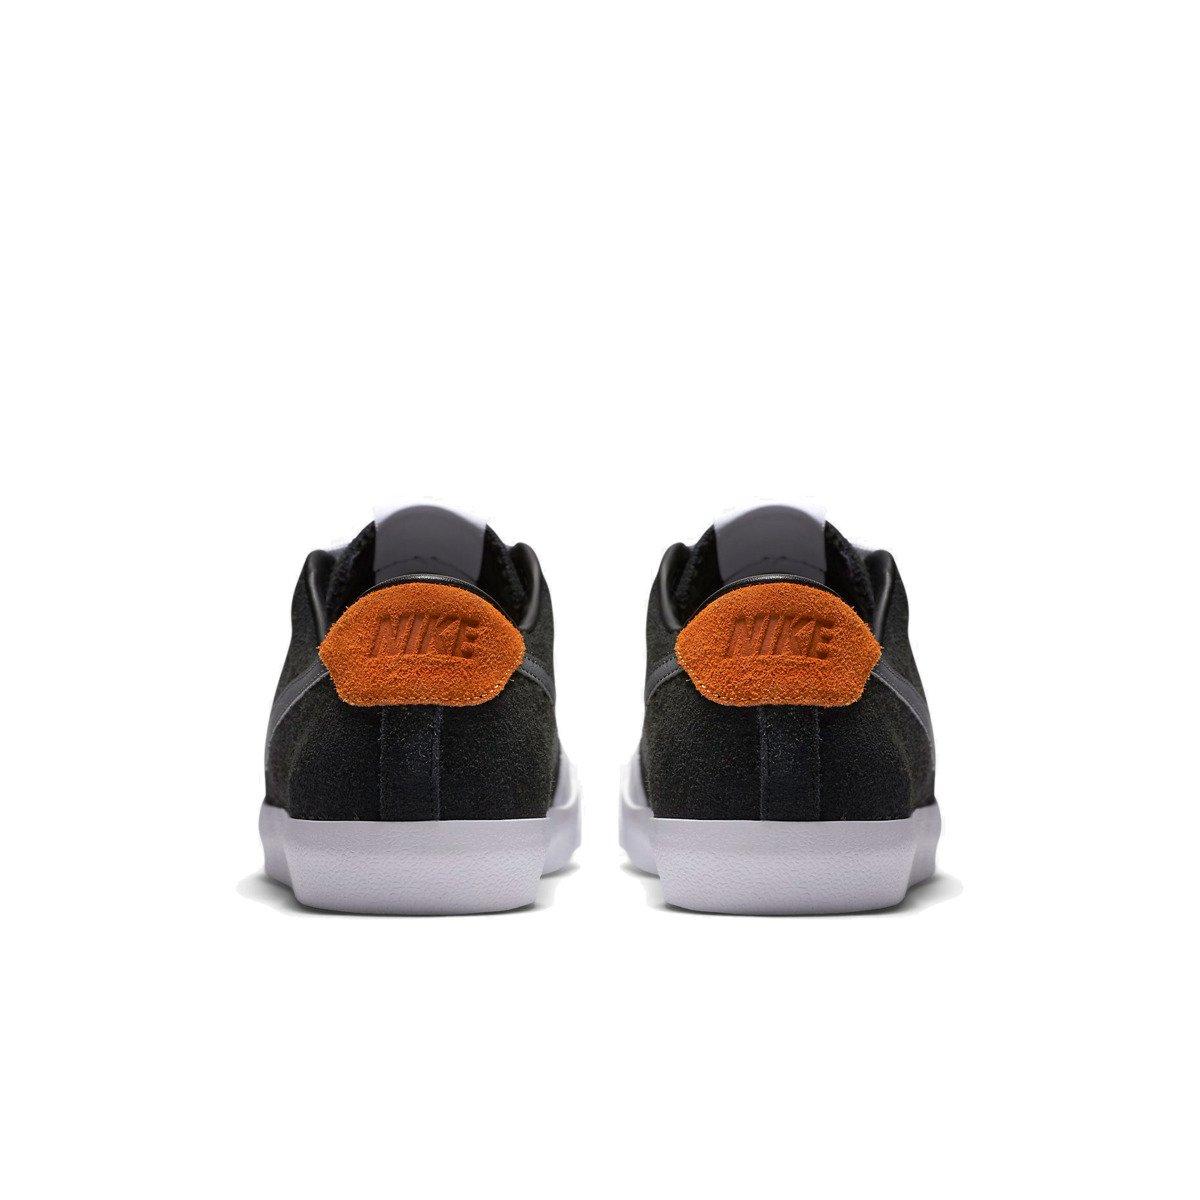 e78001ce14267 ... buty nike sb air zoom all court ck black cool grey-vivid orange-  Kliknij